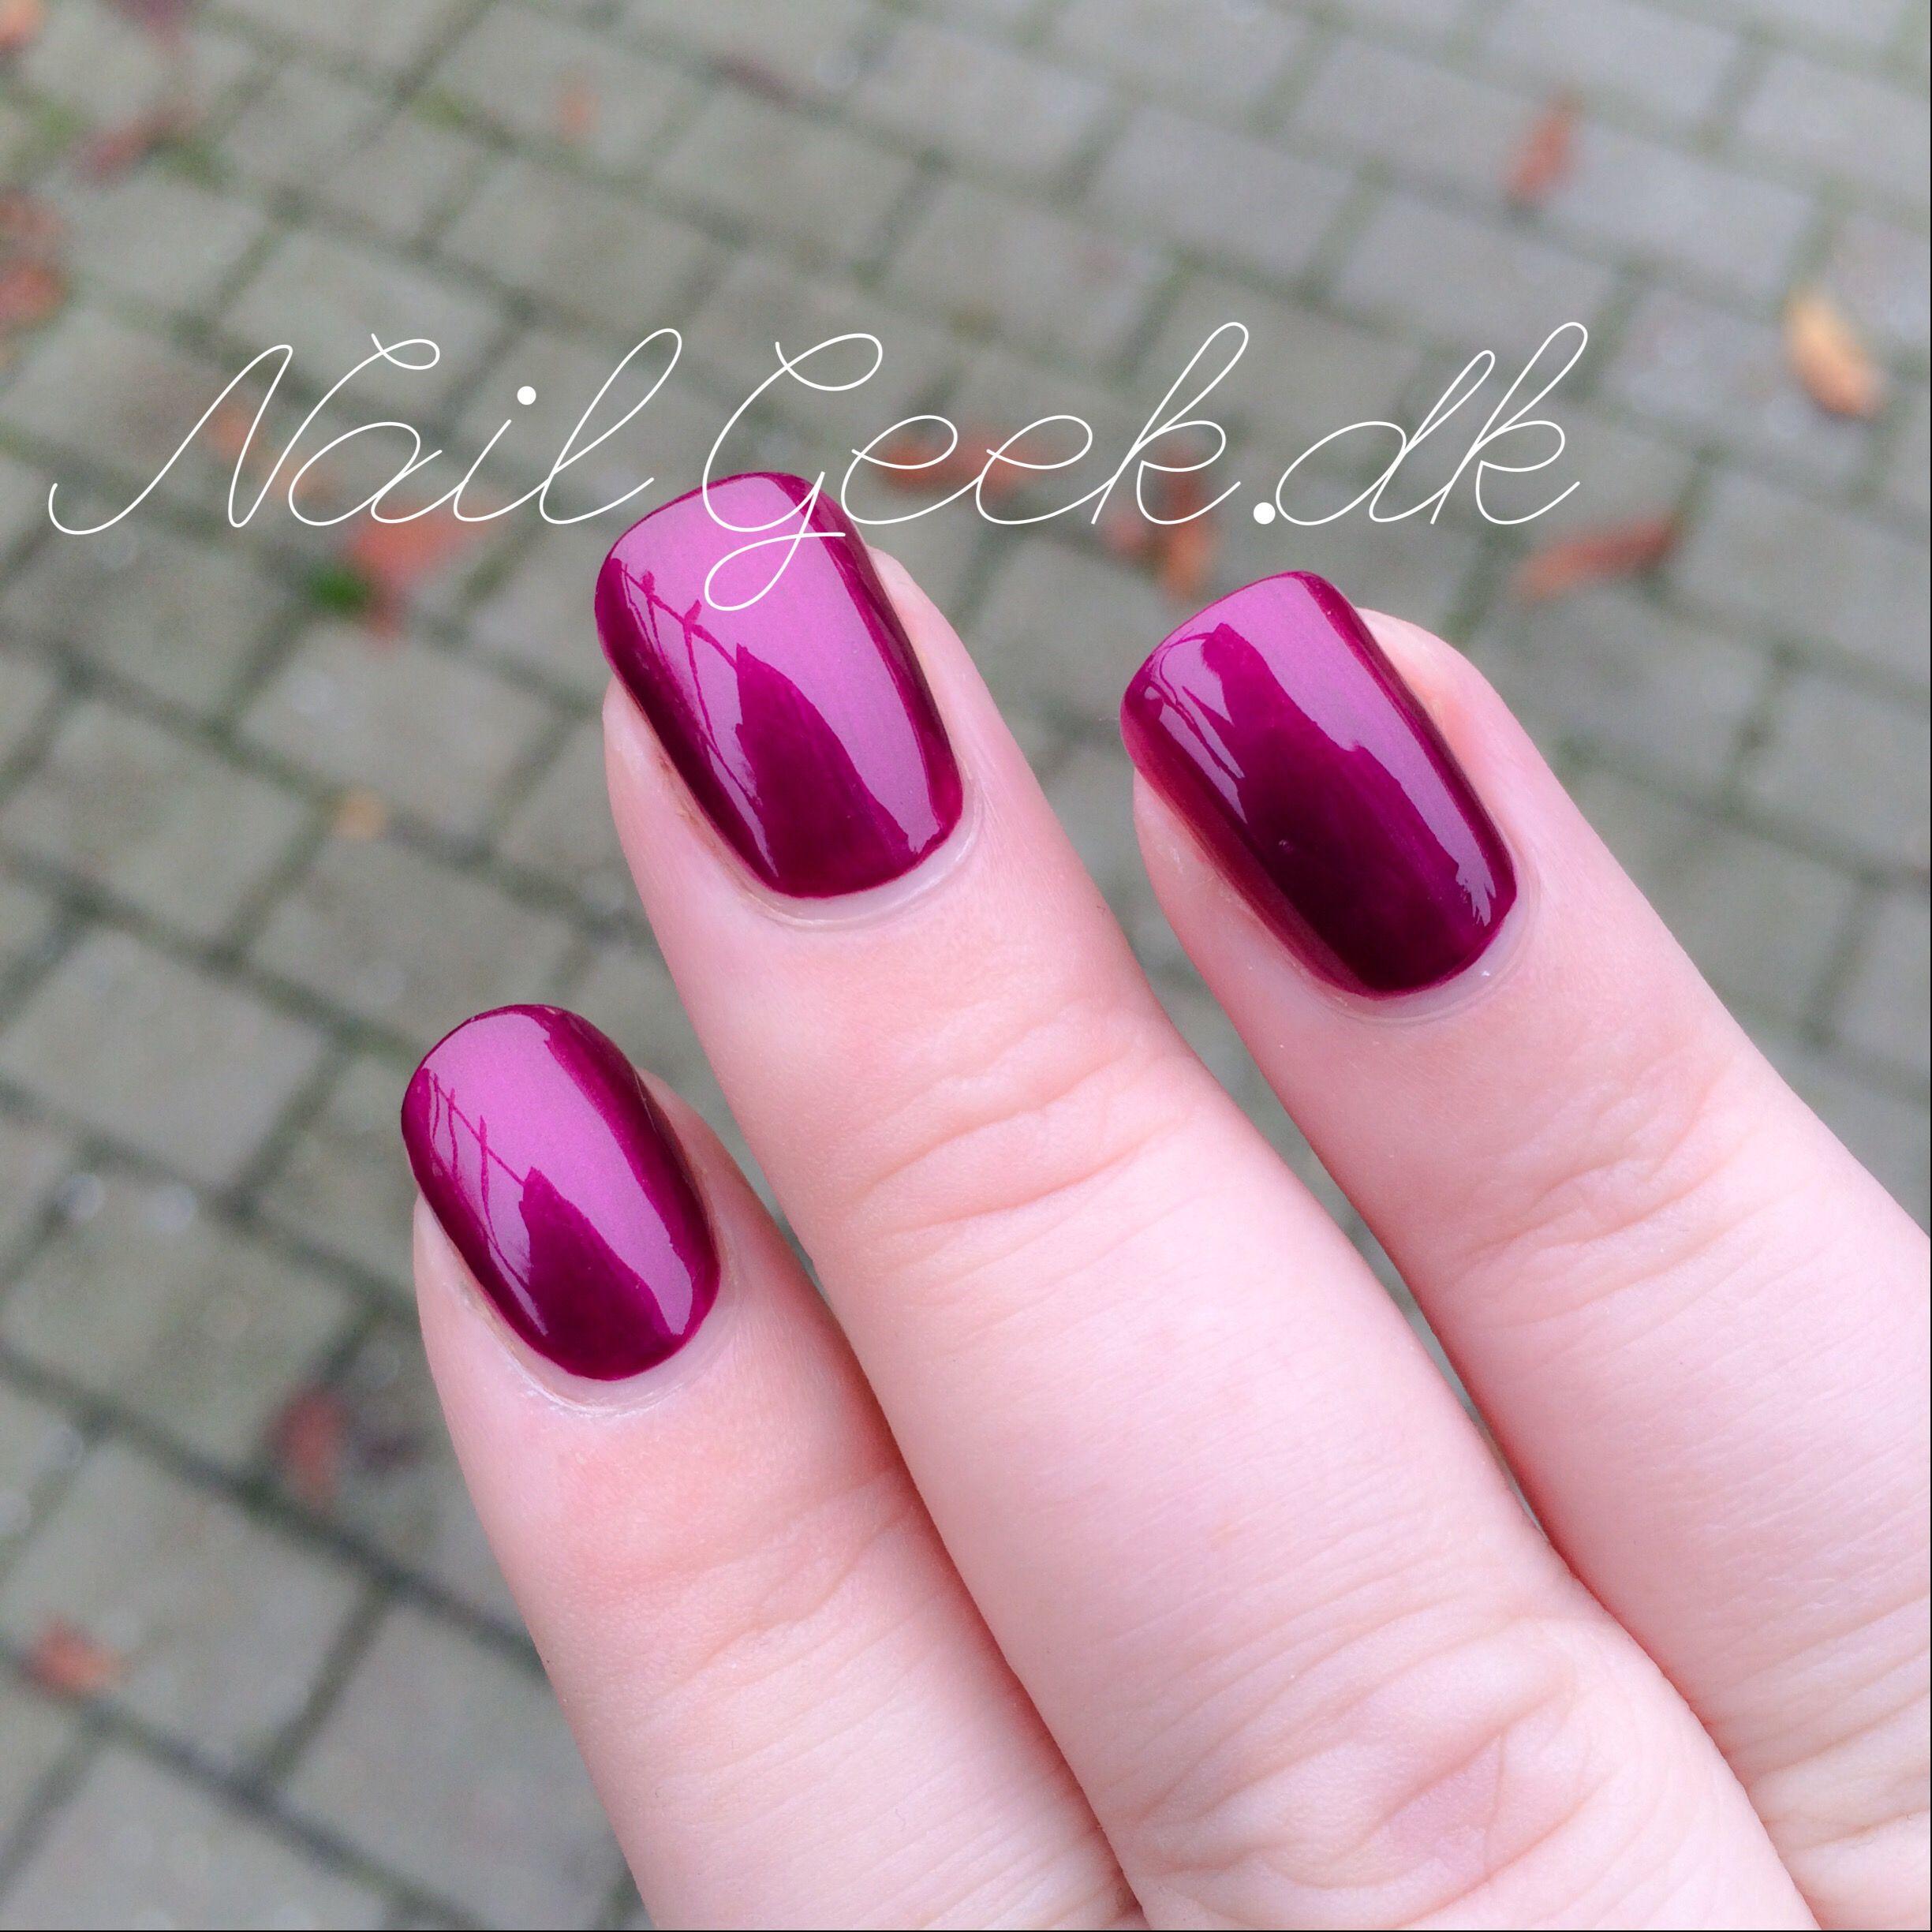 OPI Kiss me of elf | Nails | Pinterest